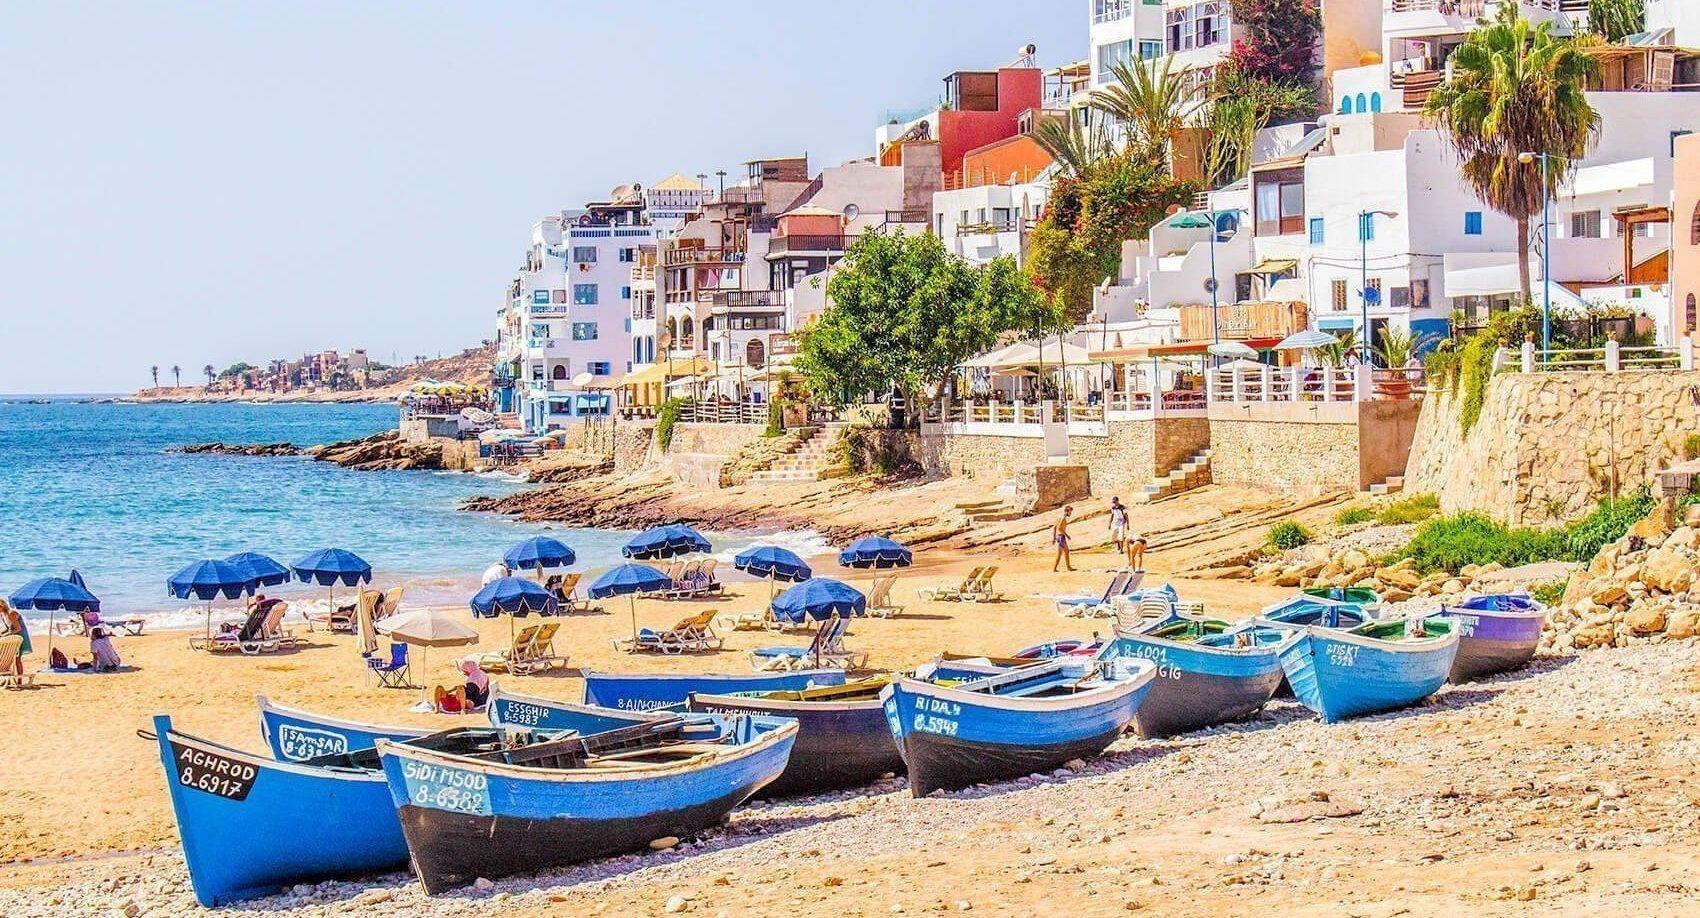 Retourvliegtickets Amsterdam-Agadir (Marokko) EasyJet januari 2020